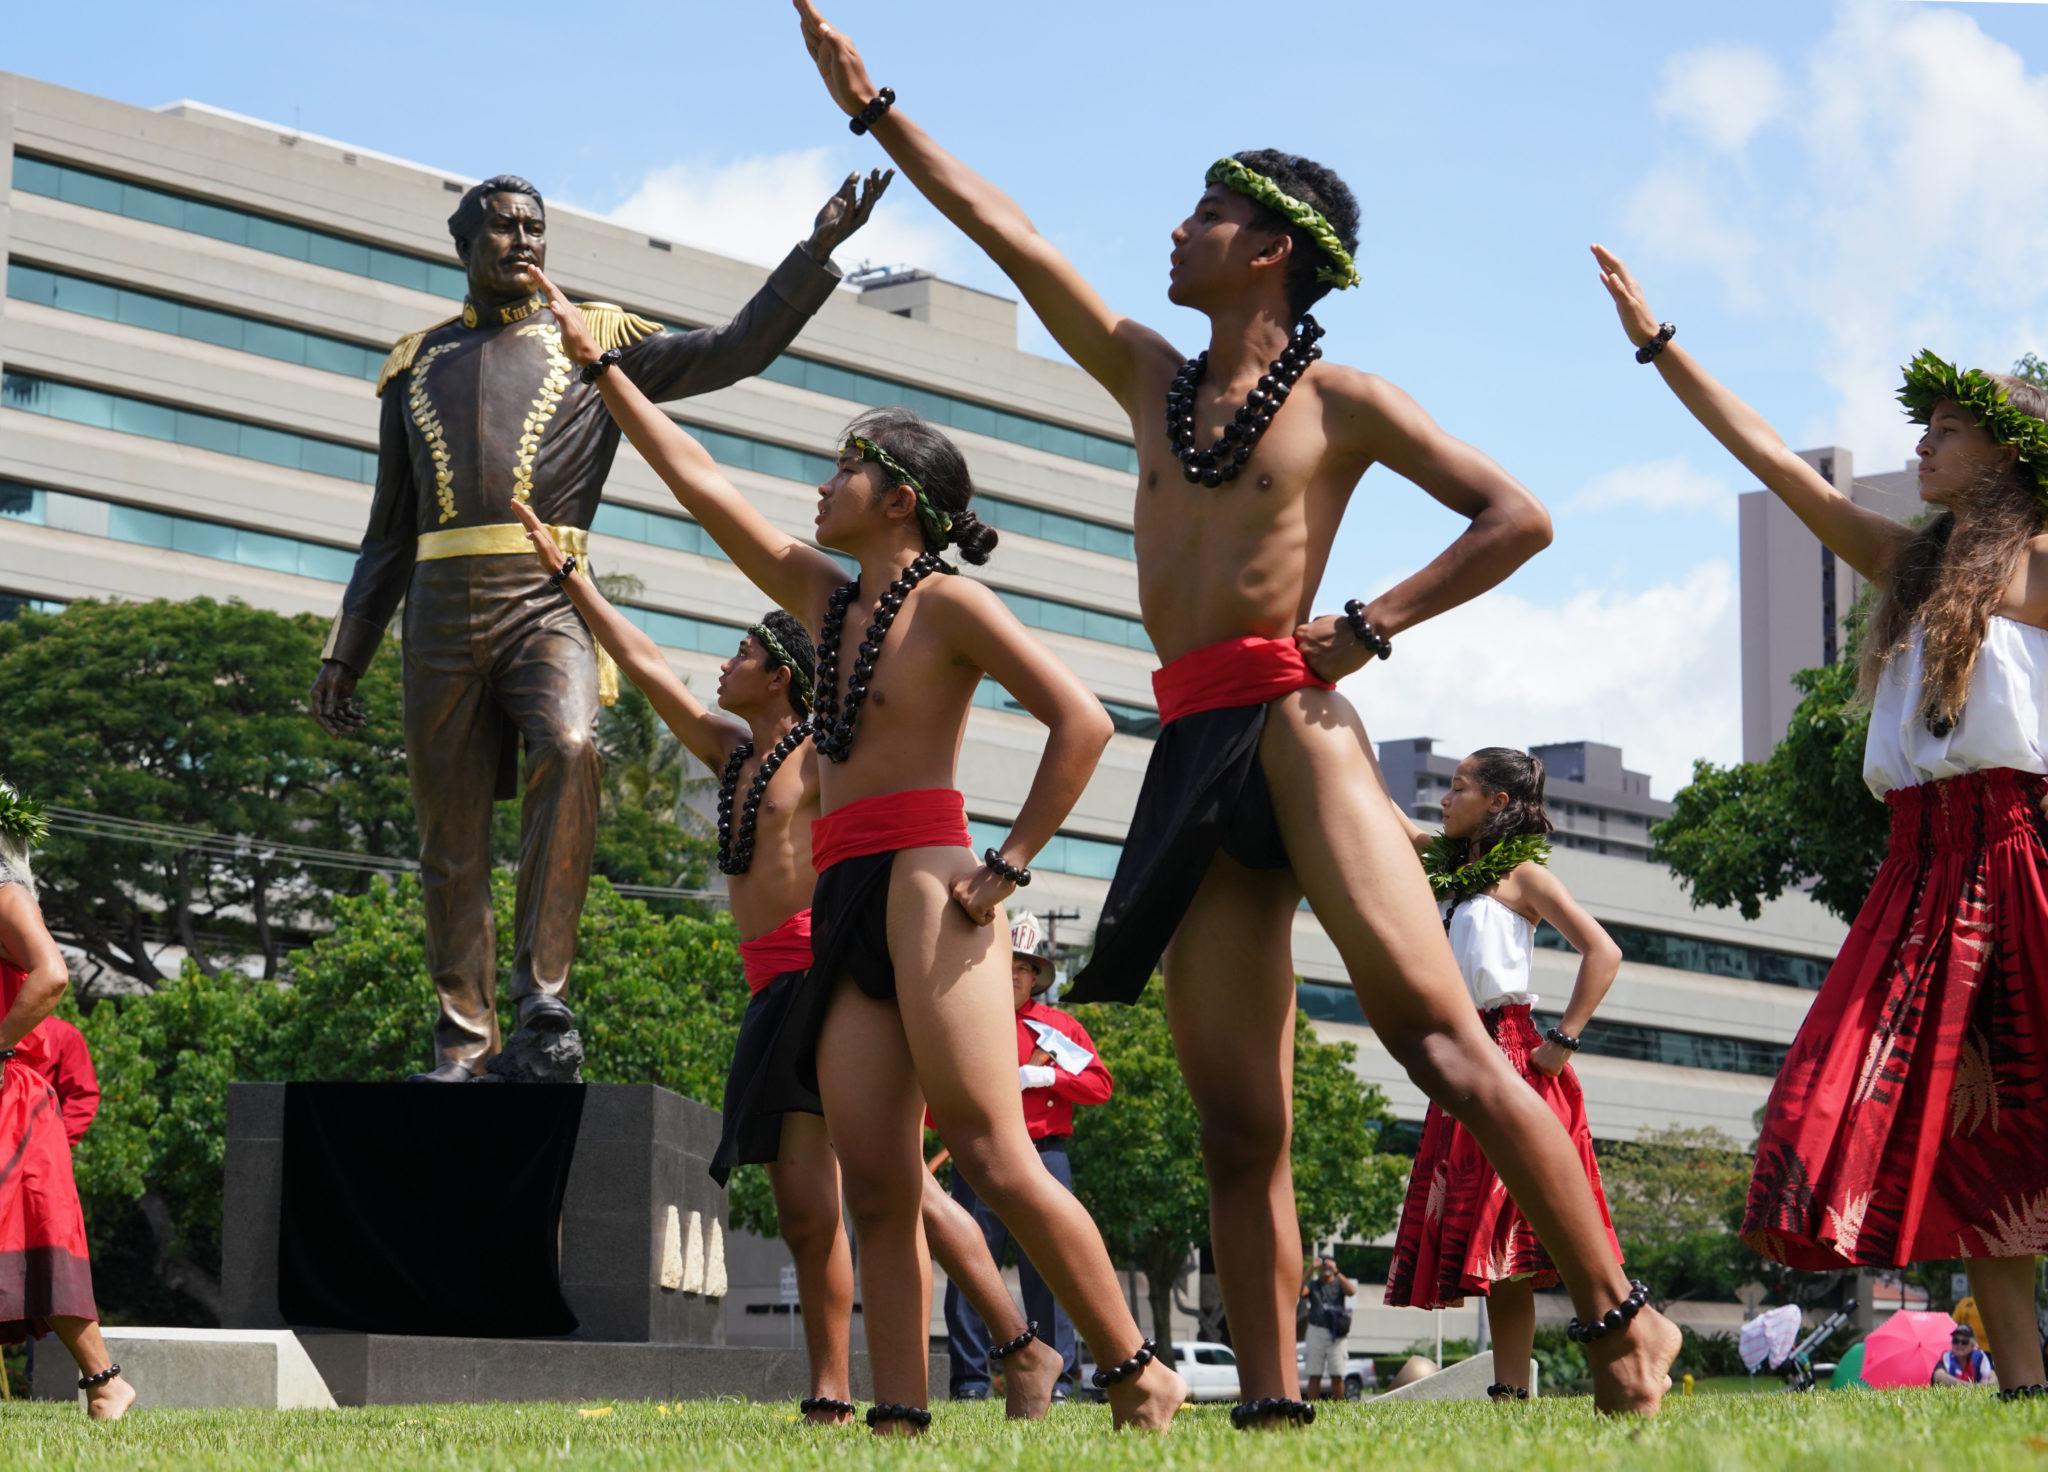 <p>Dancers from Na Pualei O Likolehua under the direction of Kumu Hula Niuli'i Heine perform during the dedication.</p>